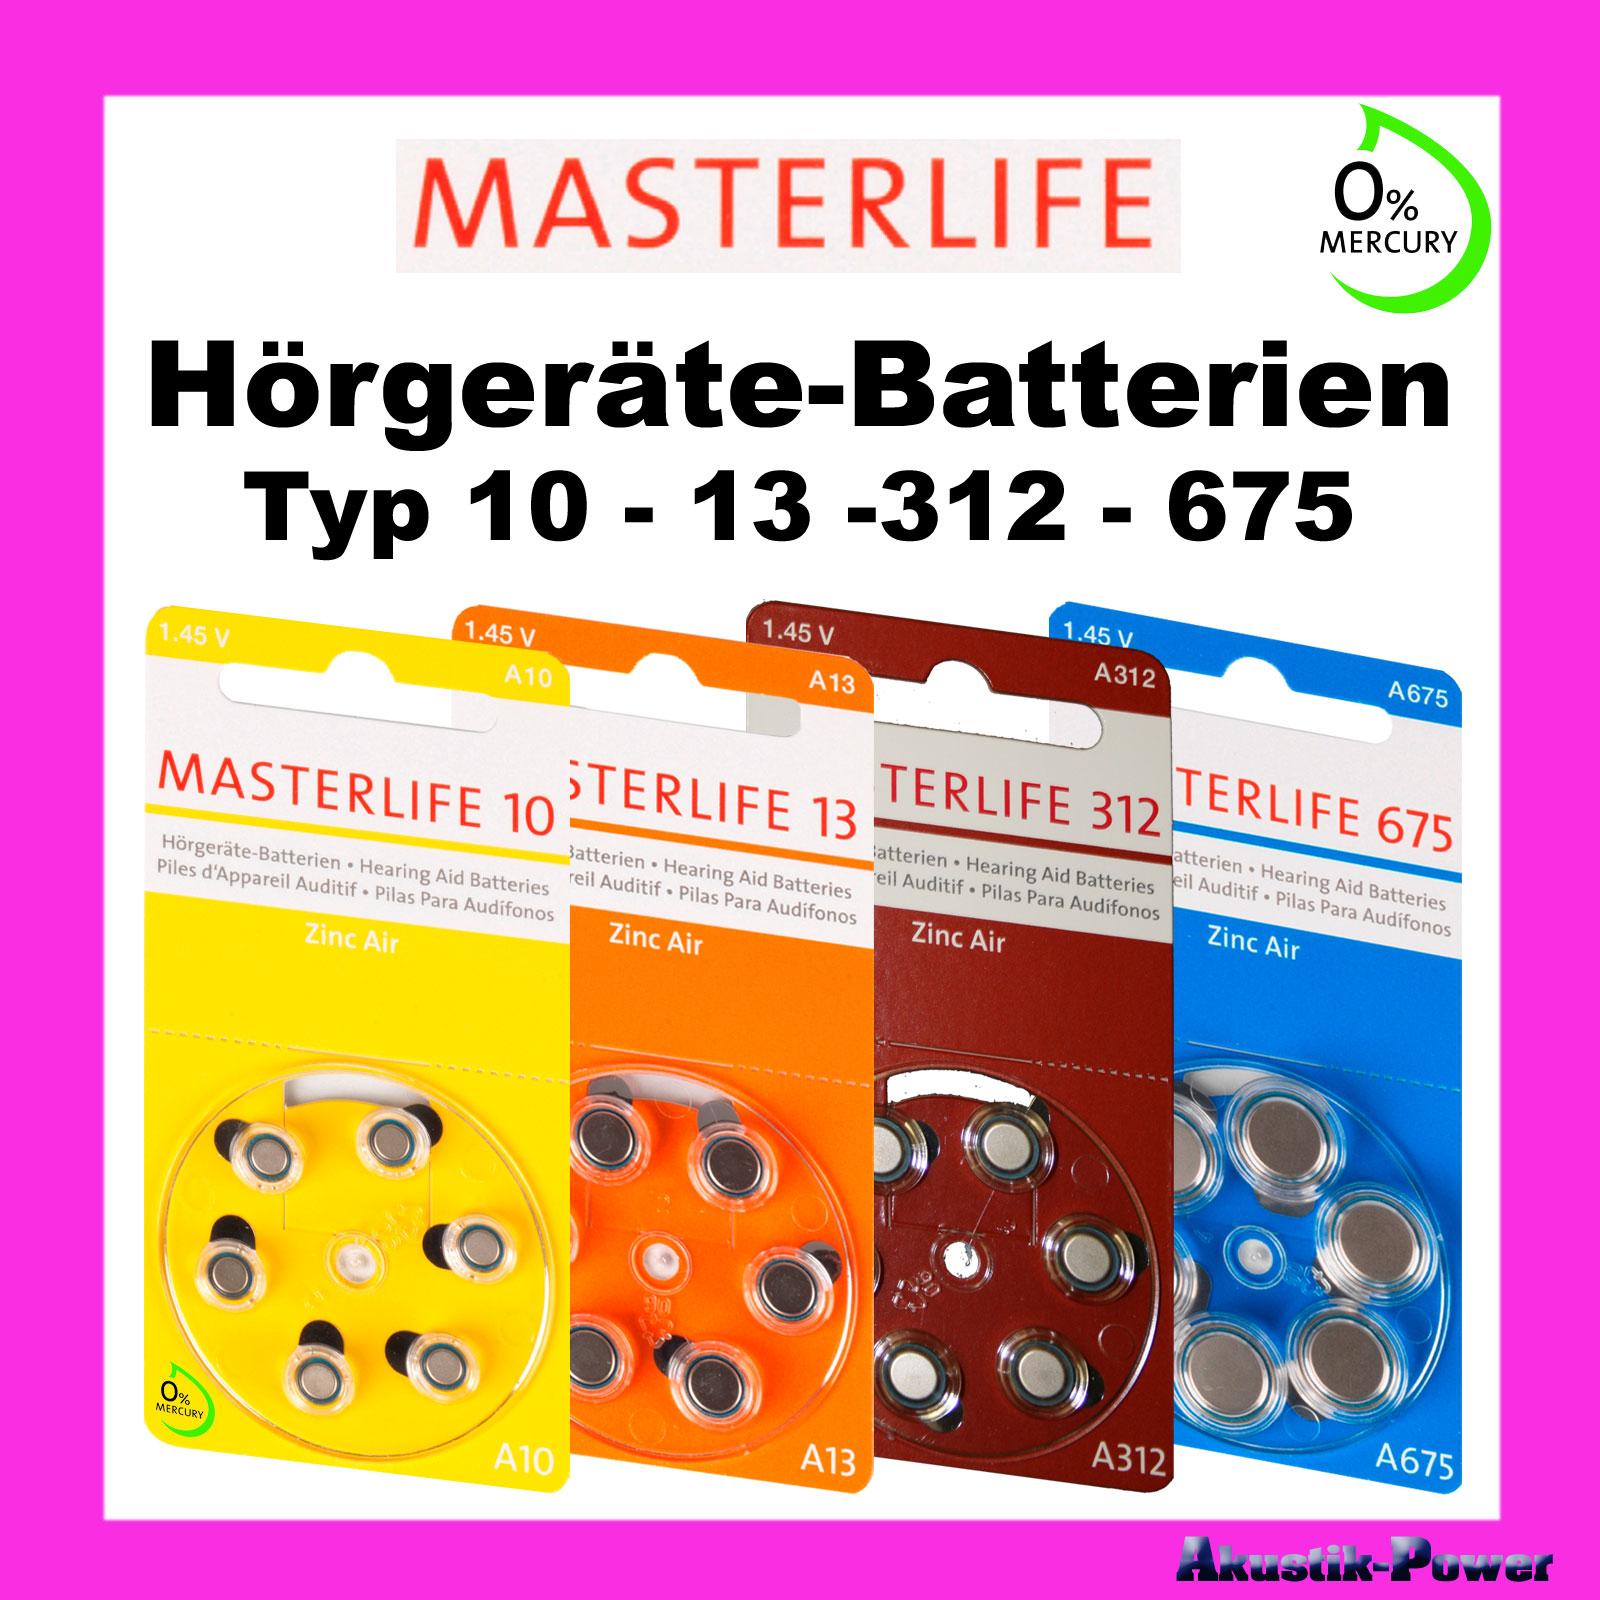 masterlife h rger te batterien typ 10 13 312 675 auswahl mercury free ebay. Black Bedroom Furniture Sets. Home Design Ideas